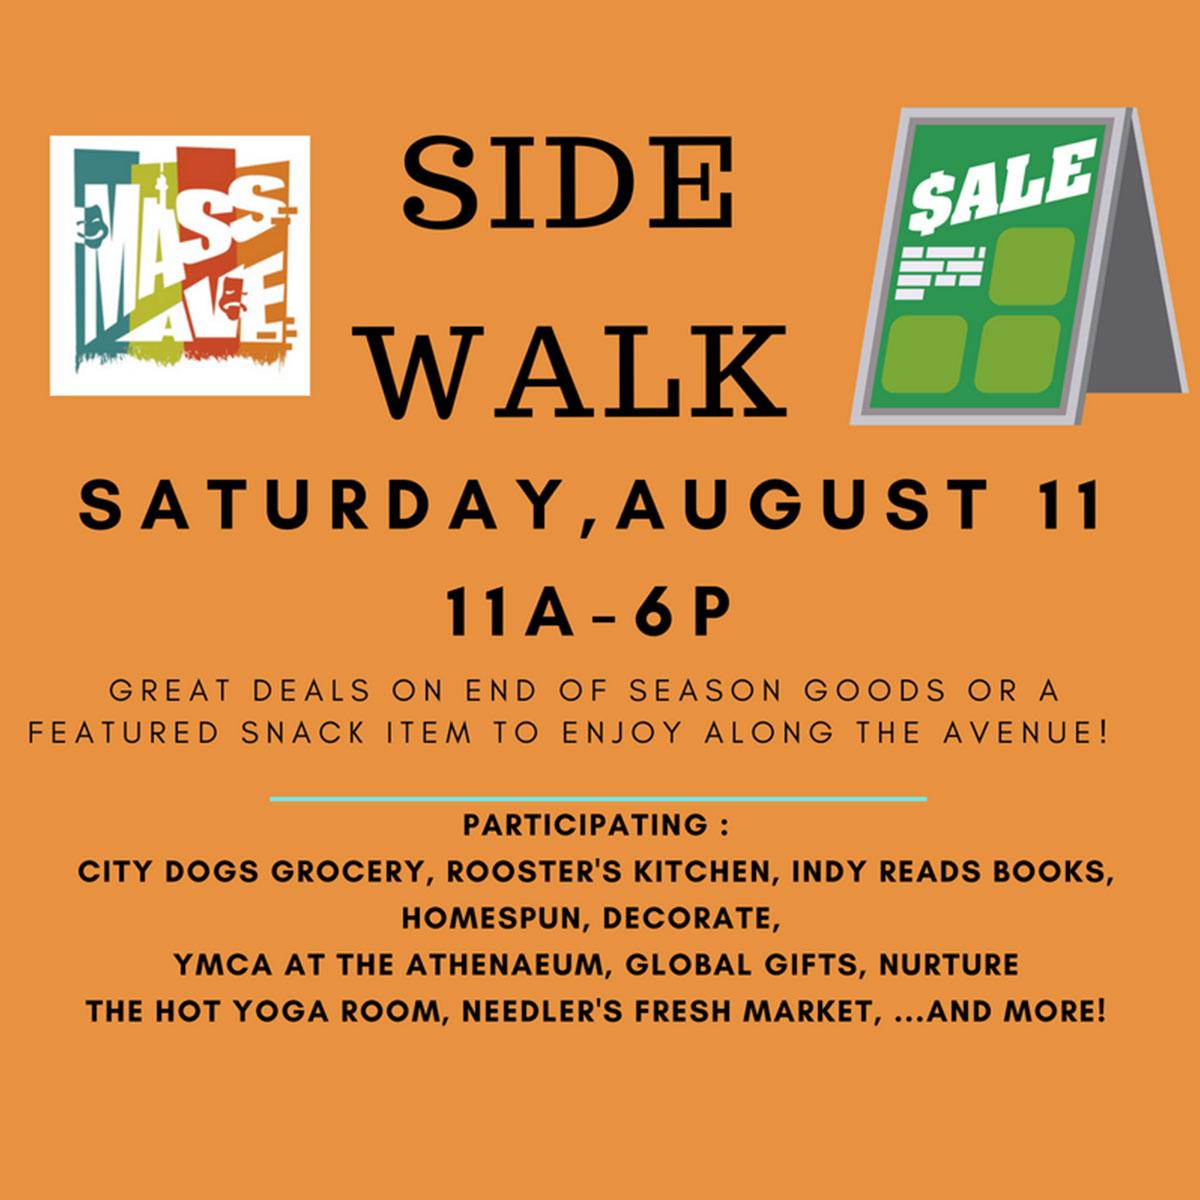 ICYMI July 27 Mass Ave Sidewalk Sale Saturday August 11